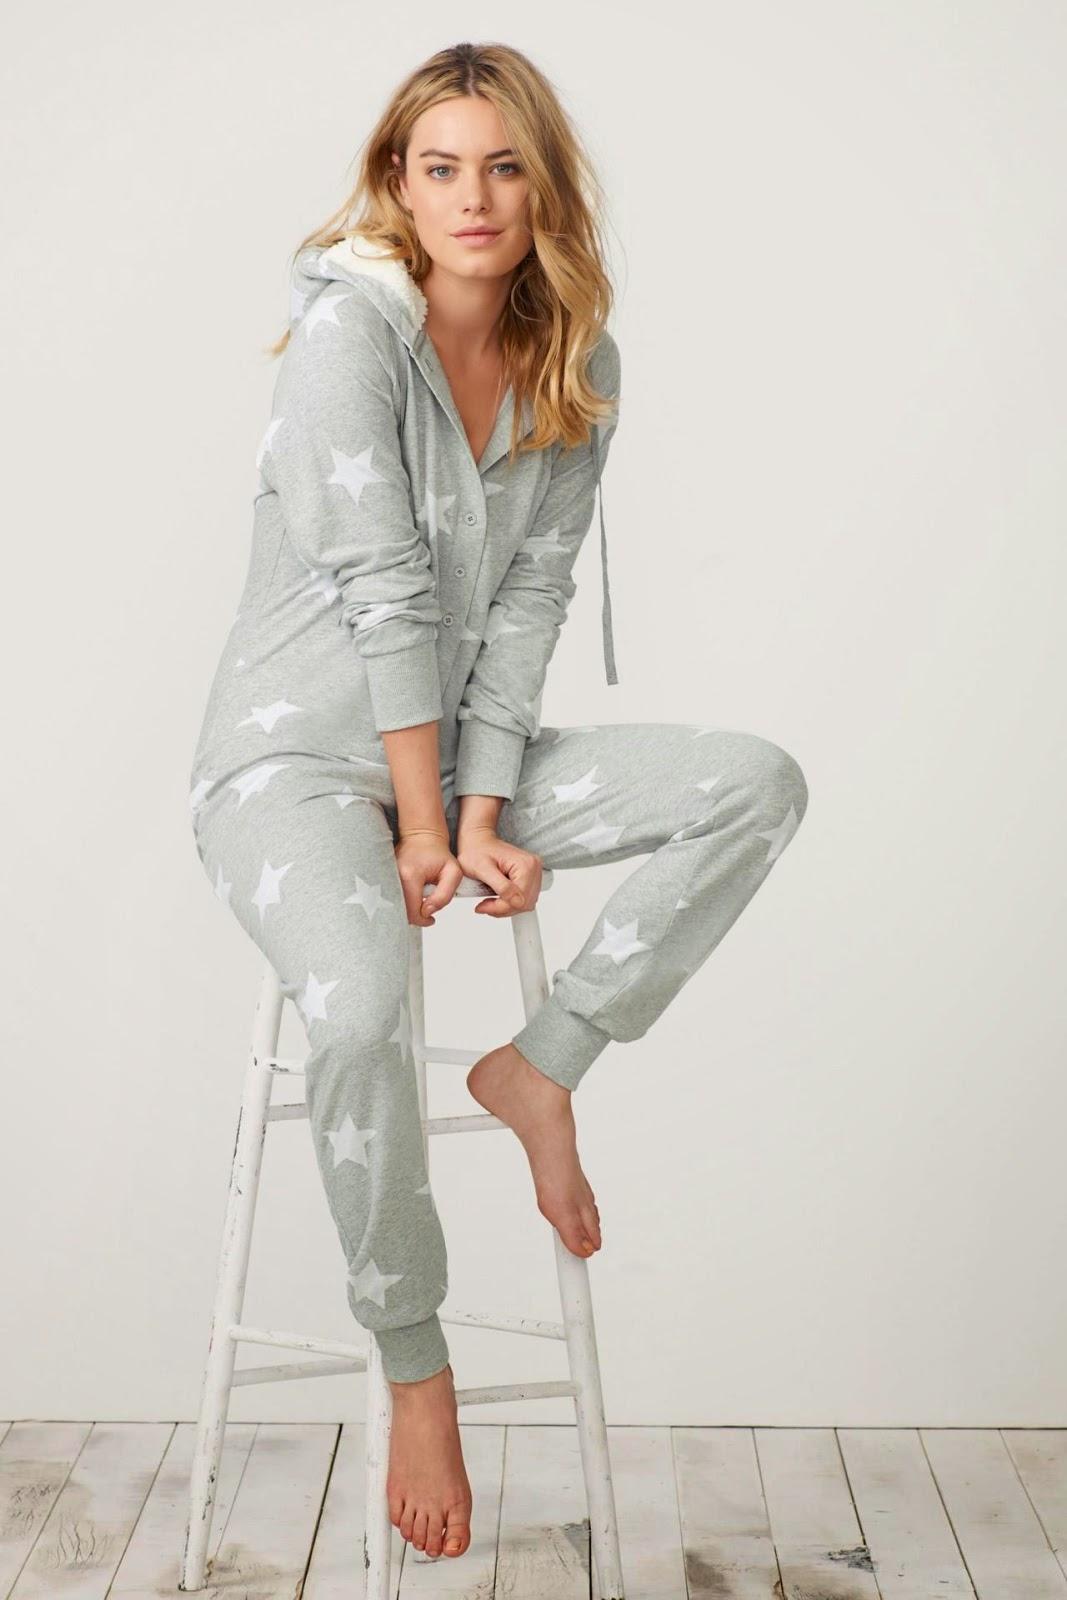 Next Sleepwear Fall/Winter 2014 Lookbook starring Camille Rowe